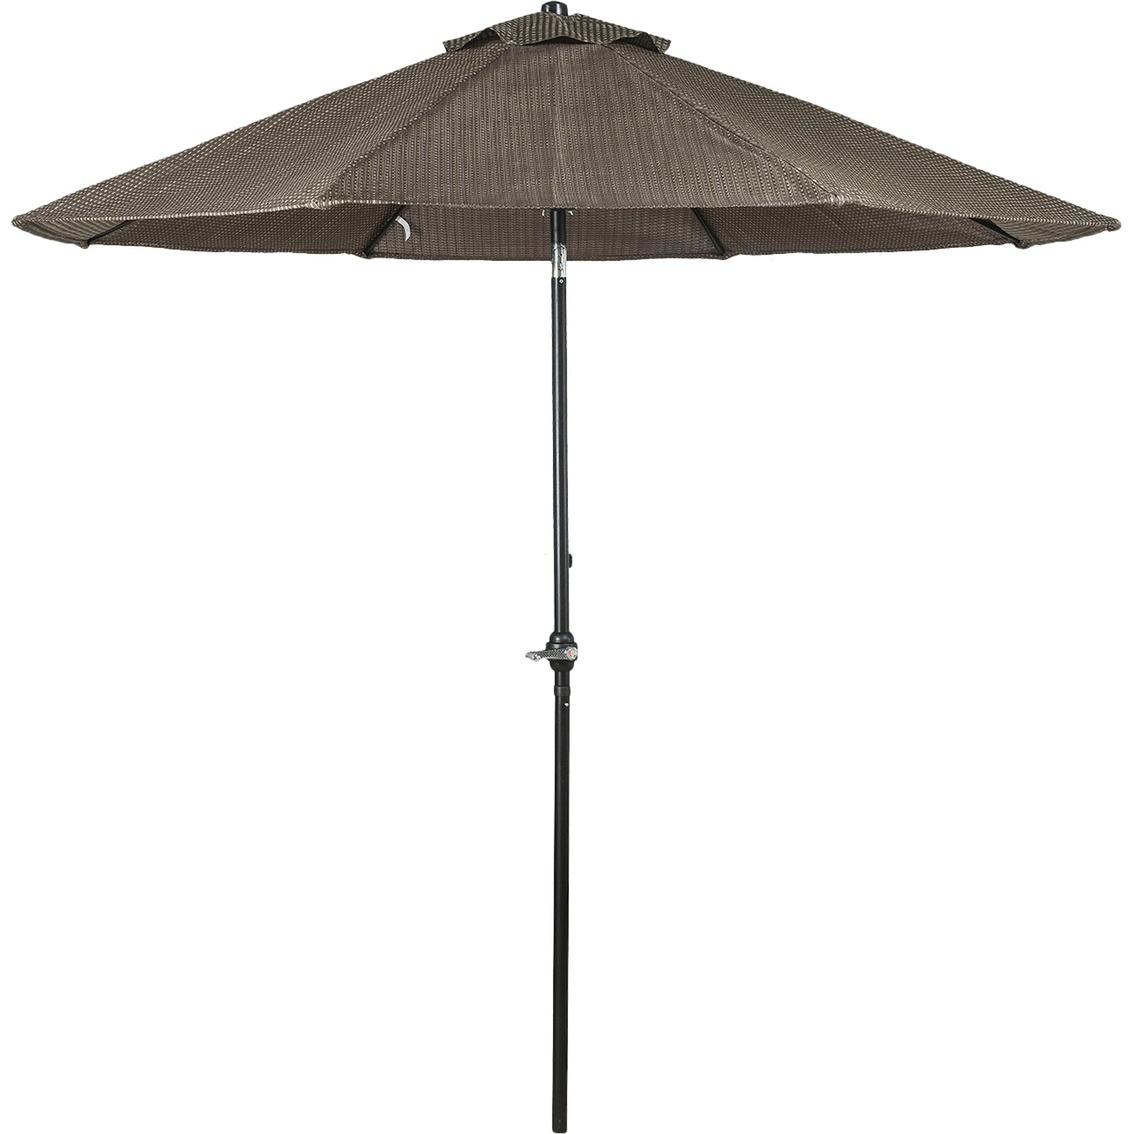 Courtyard Creations Sandpiper 8 Ft Sling Market Umbrella